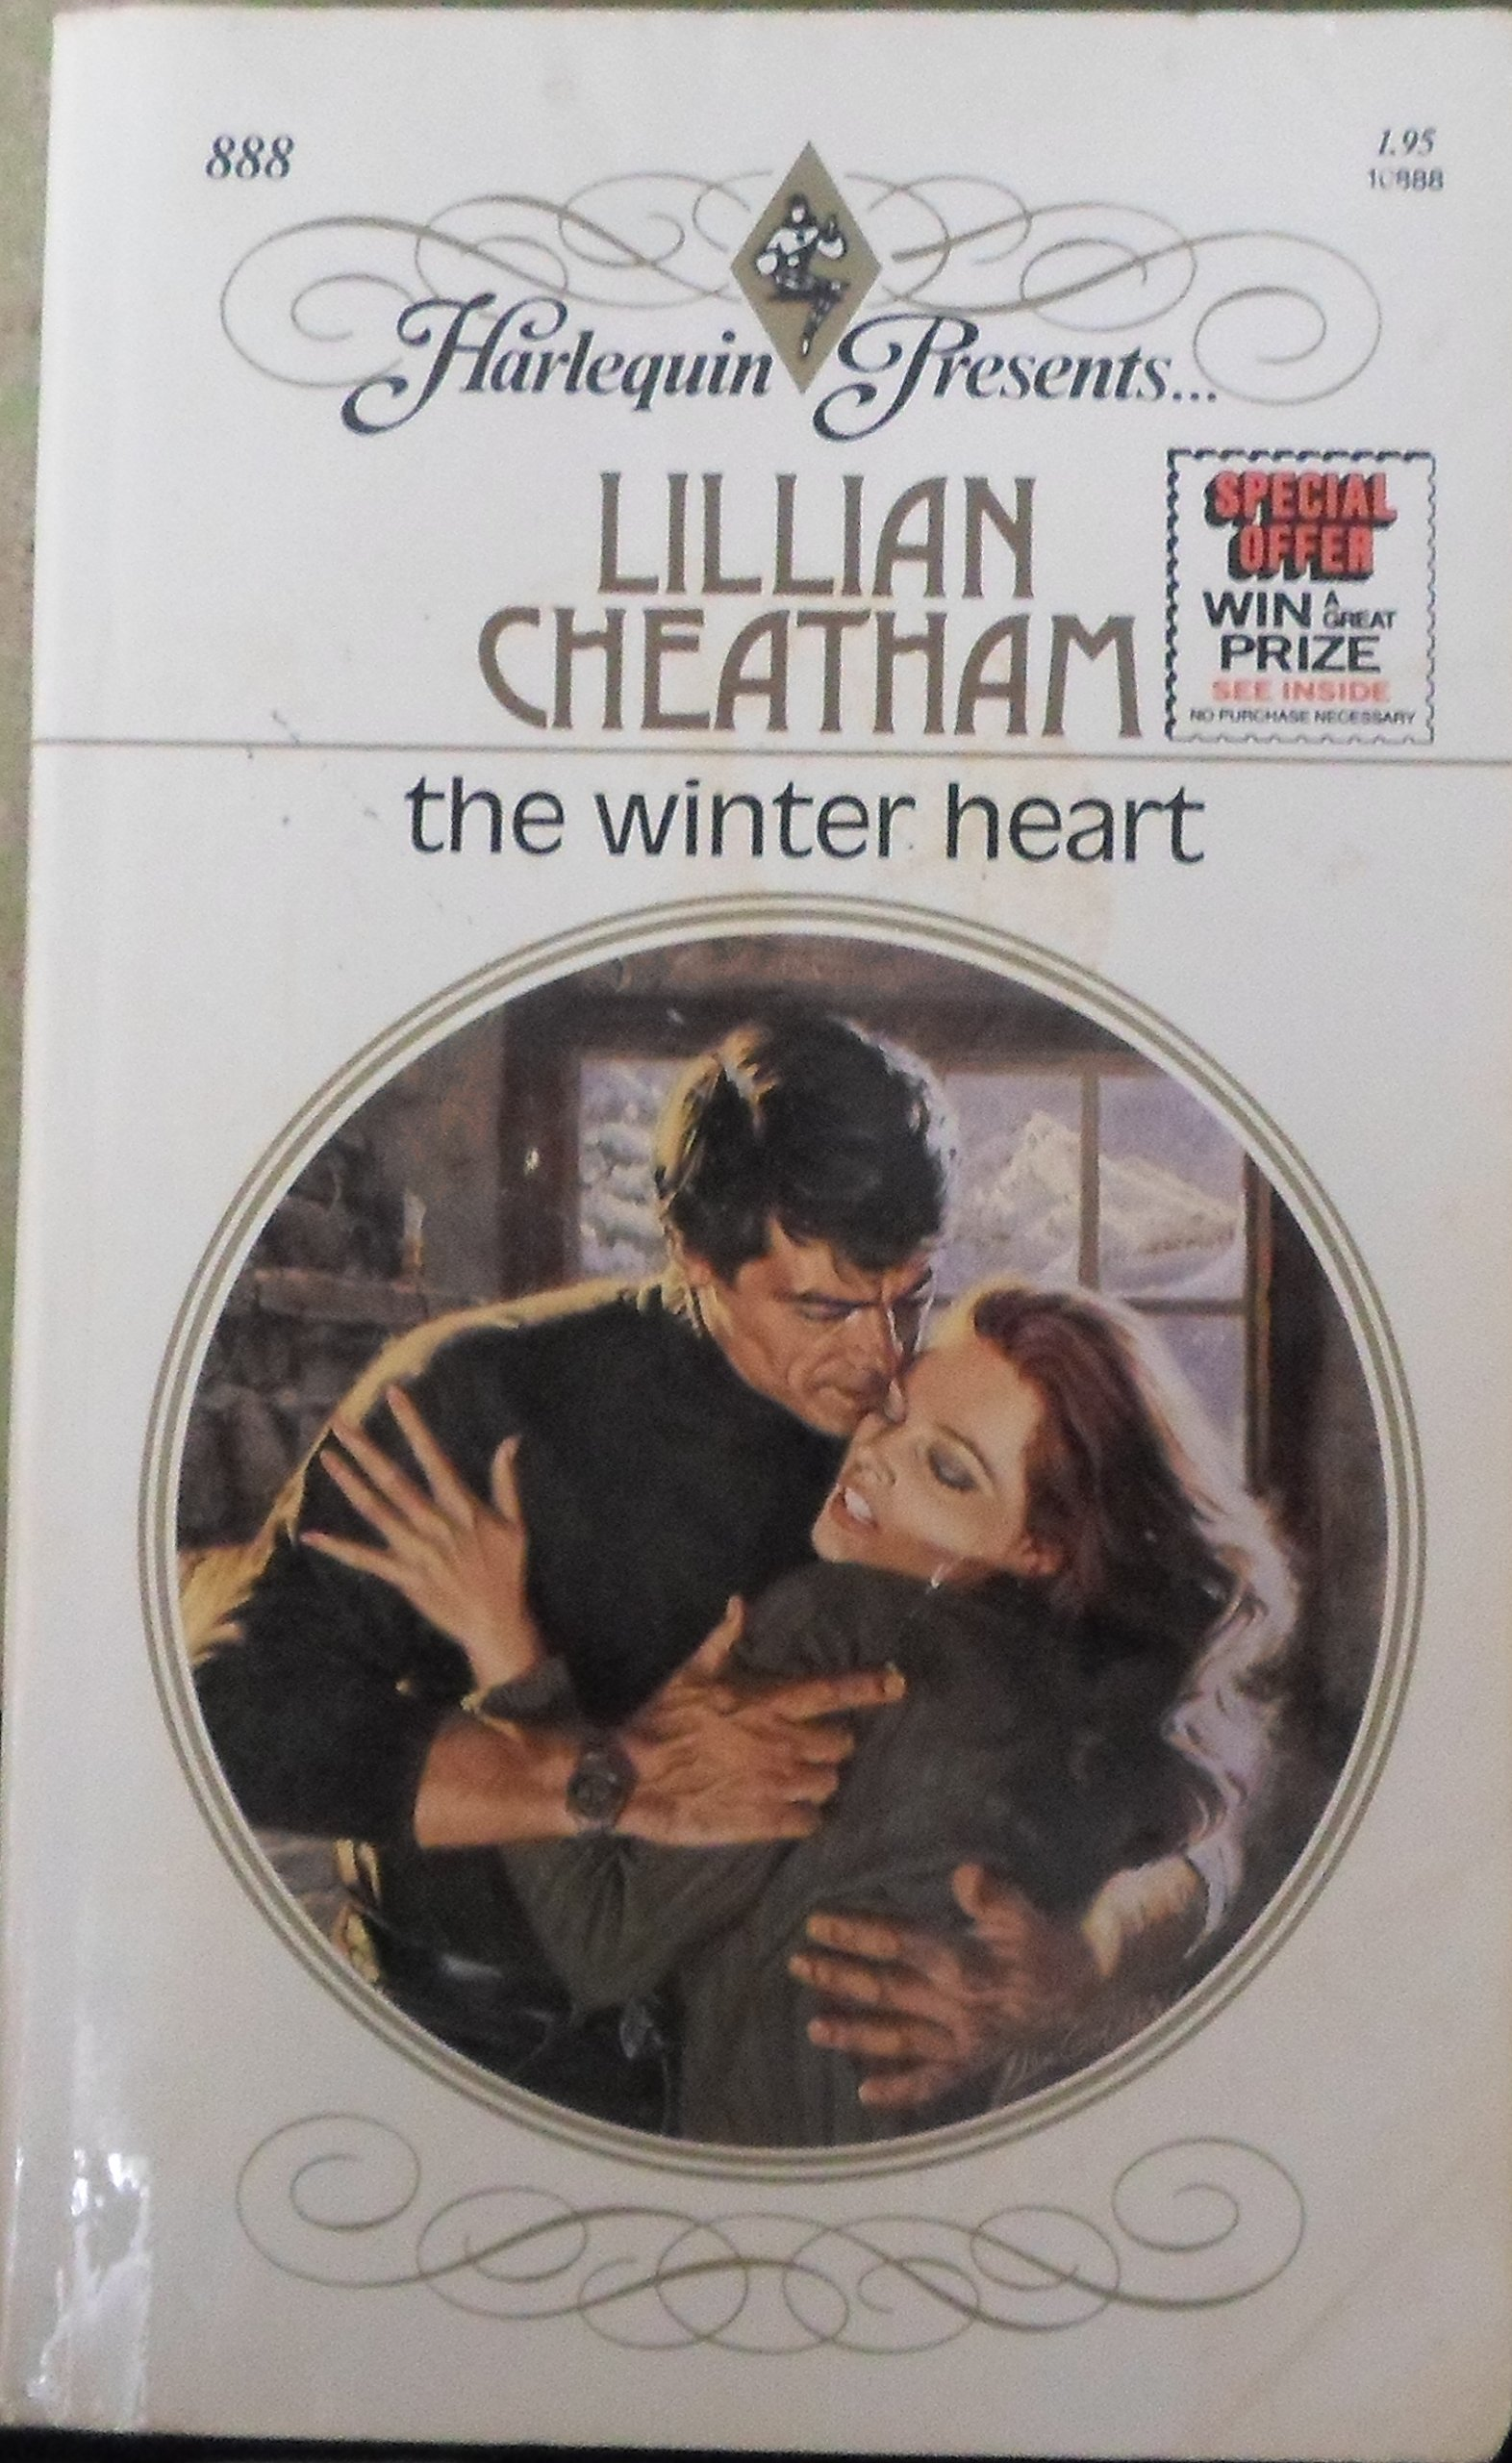 The Winter Heart: Lillian Cheatham: 9780373108886: Amazon